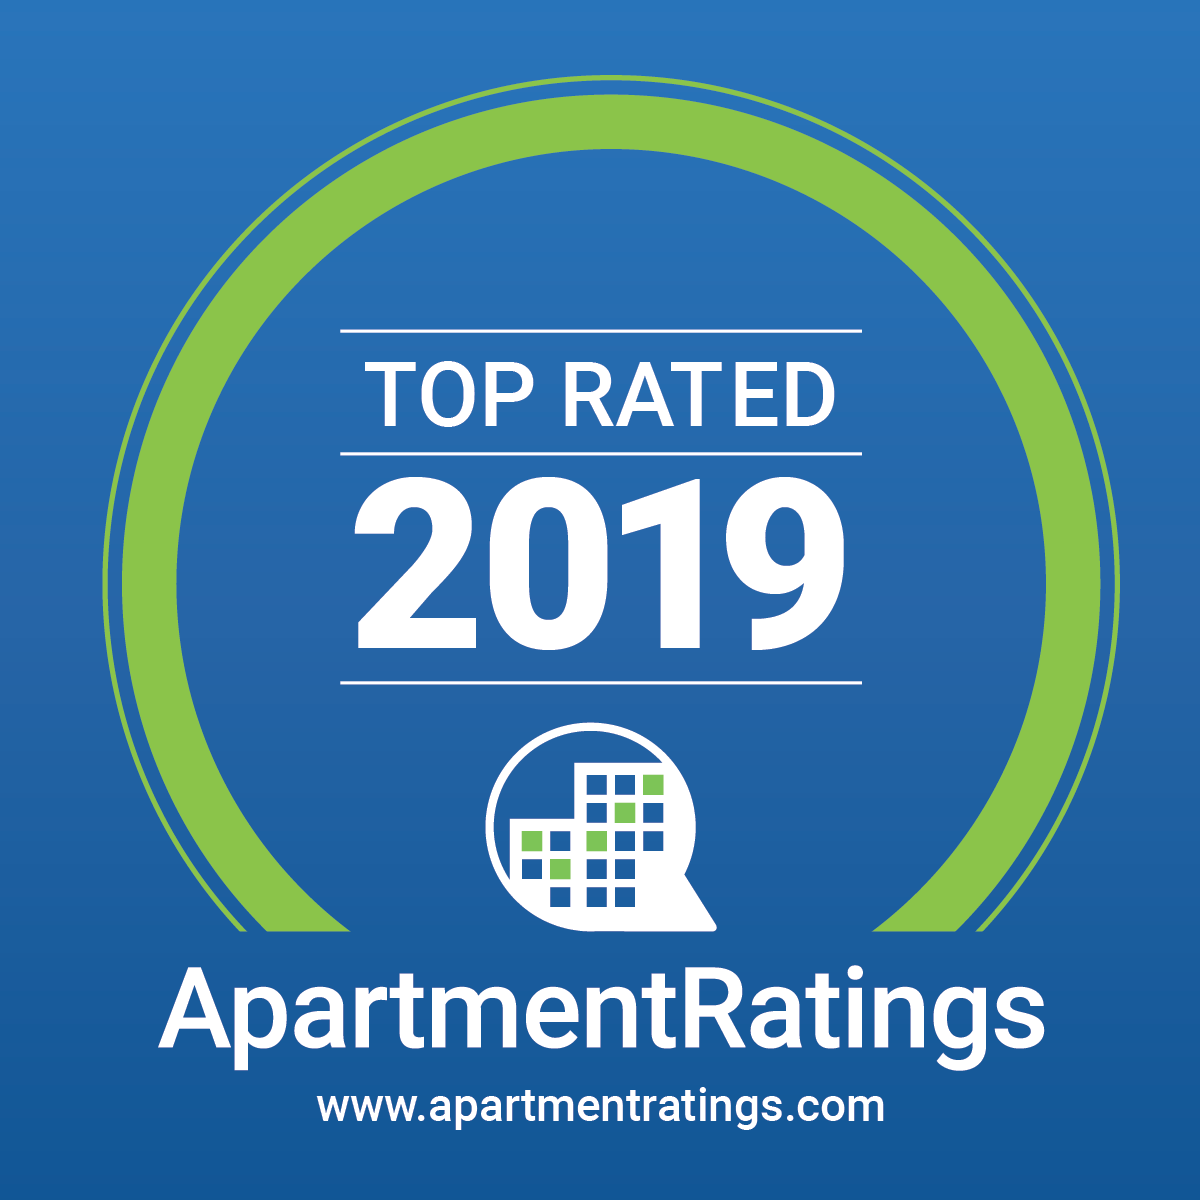 ApartmentRatings Top Rated Awards Logo